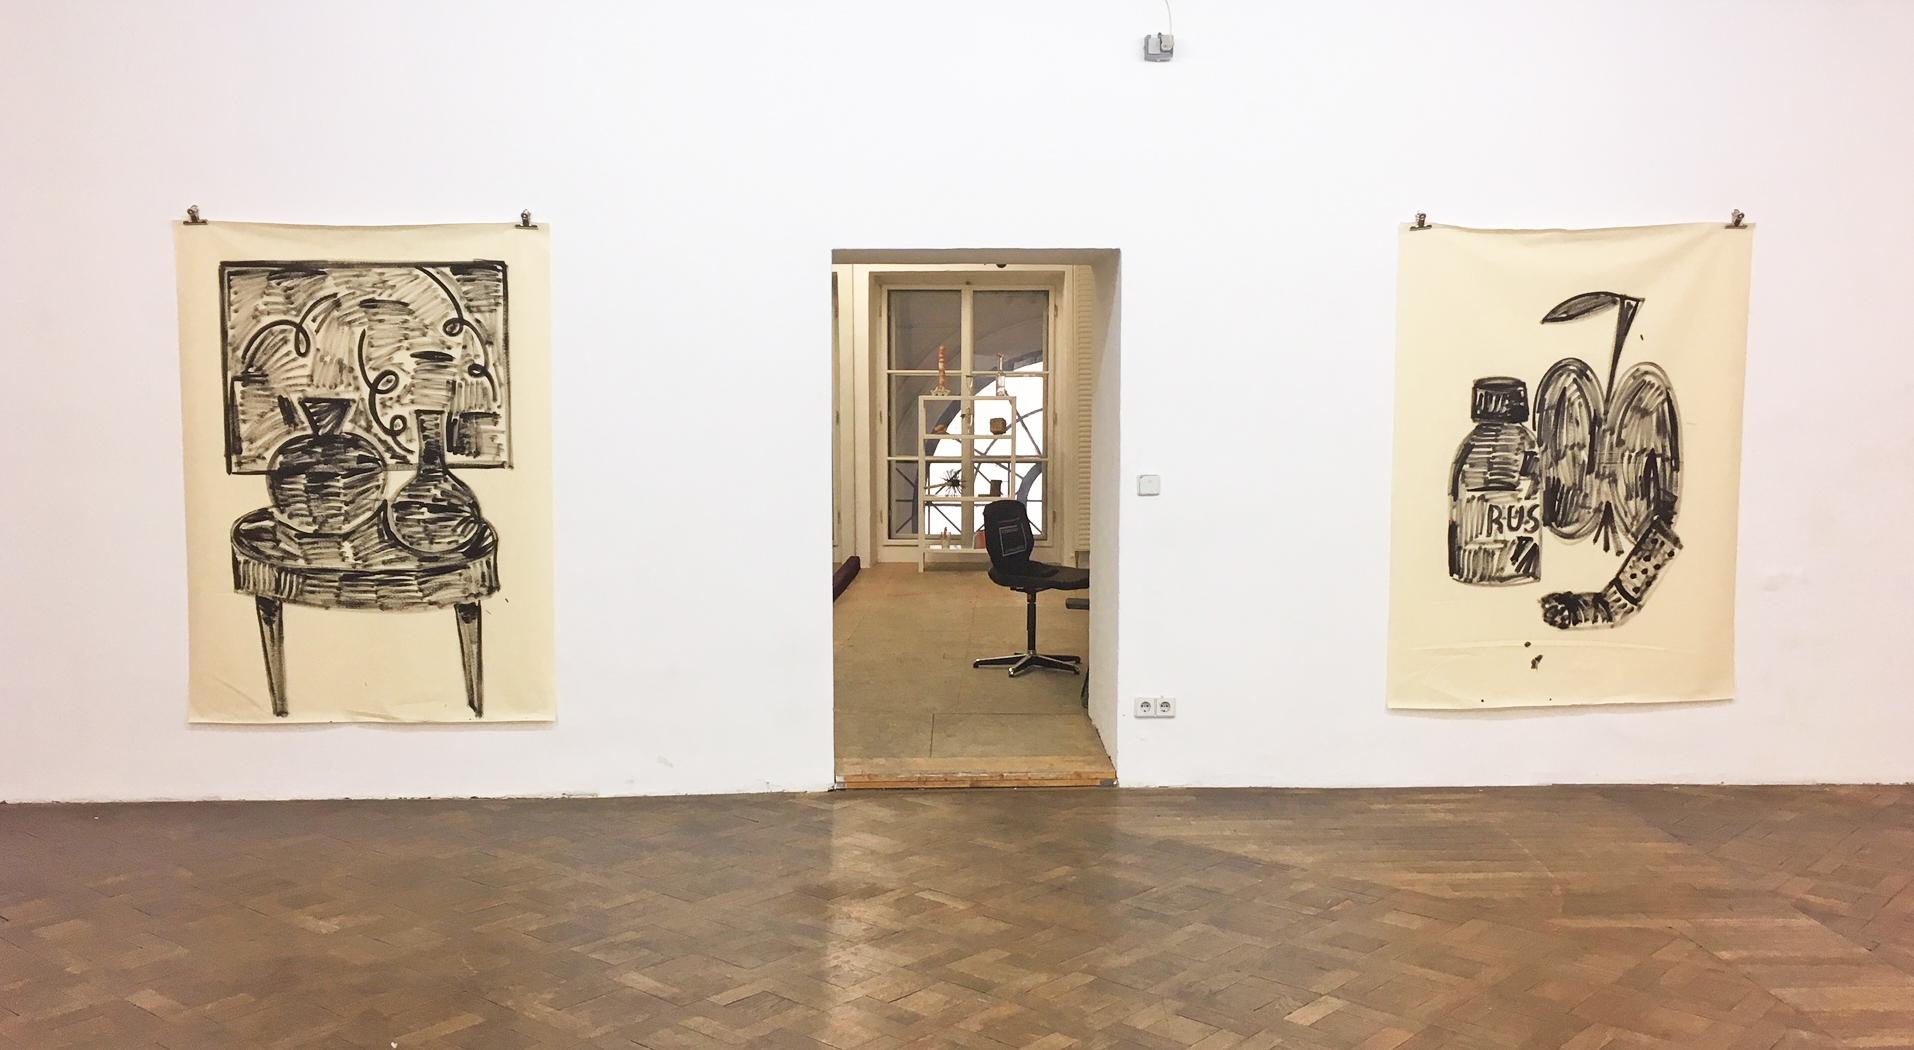 Ausstellungsansicht, Rade Petrasevic, Büro Weltausstellung, 2018